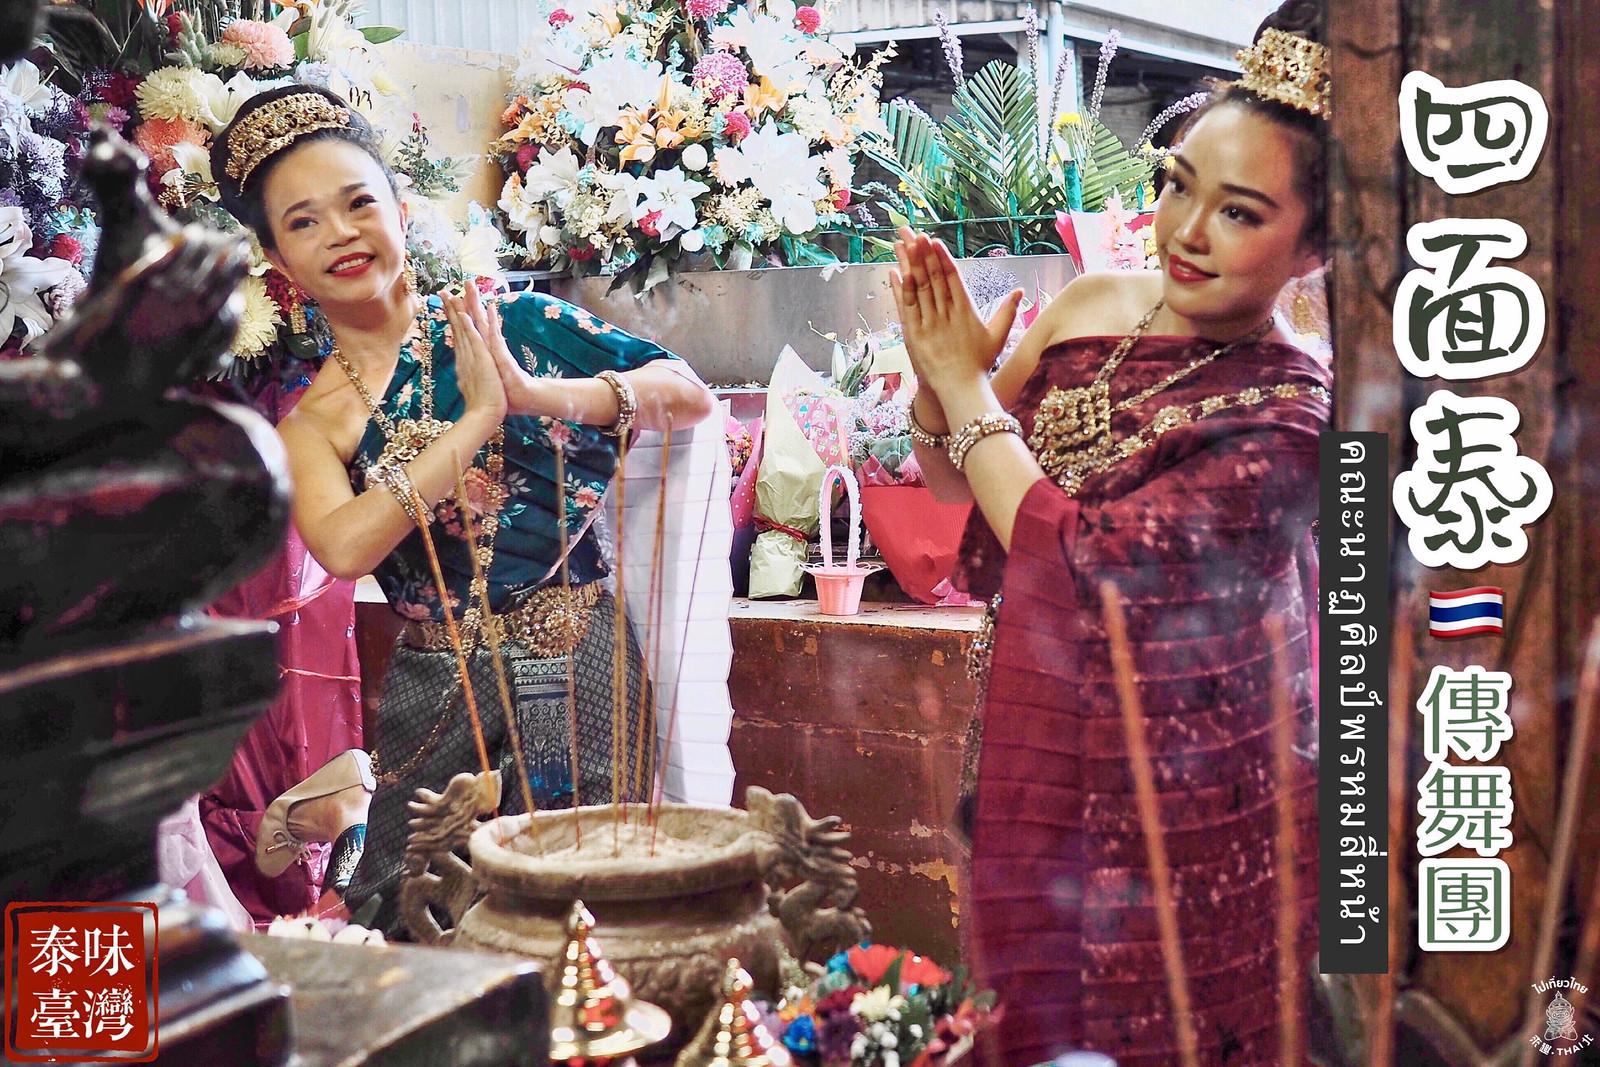 Thai愛臺灣泰國傳統舞團《四面泰傳舞團》